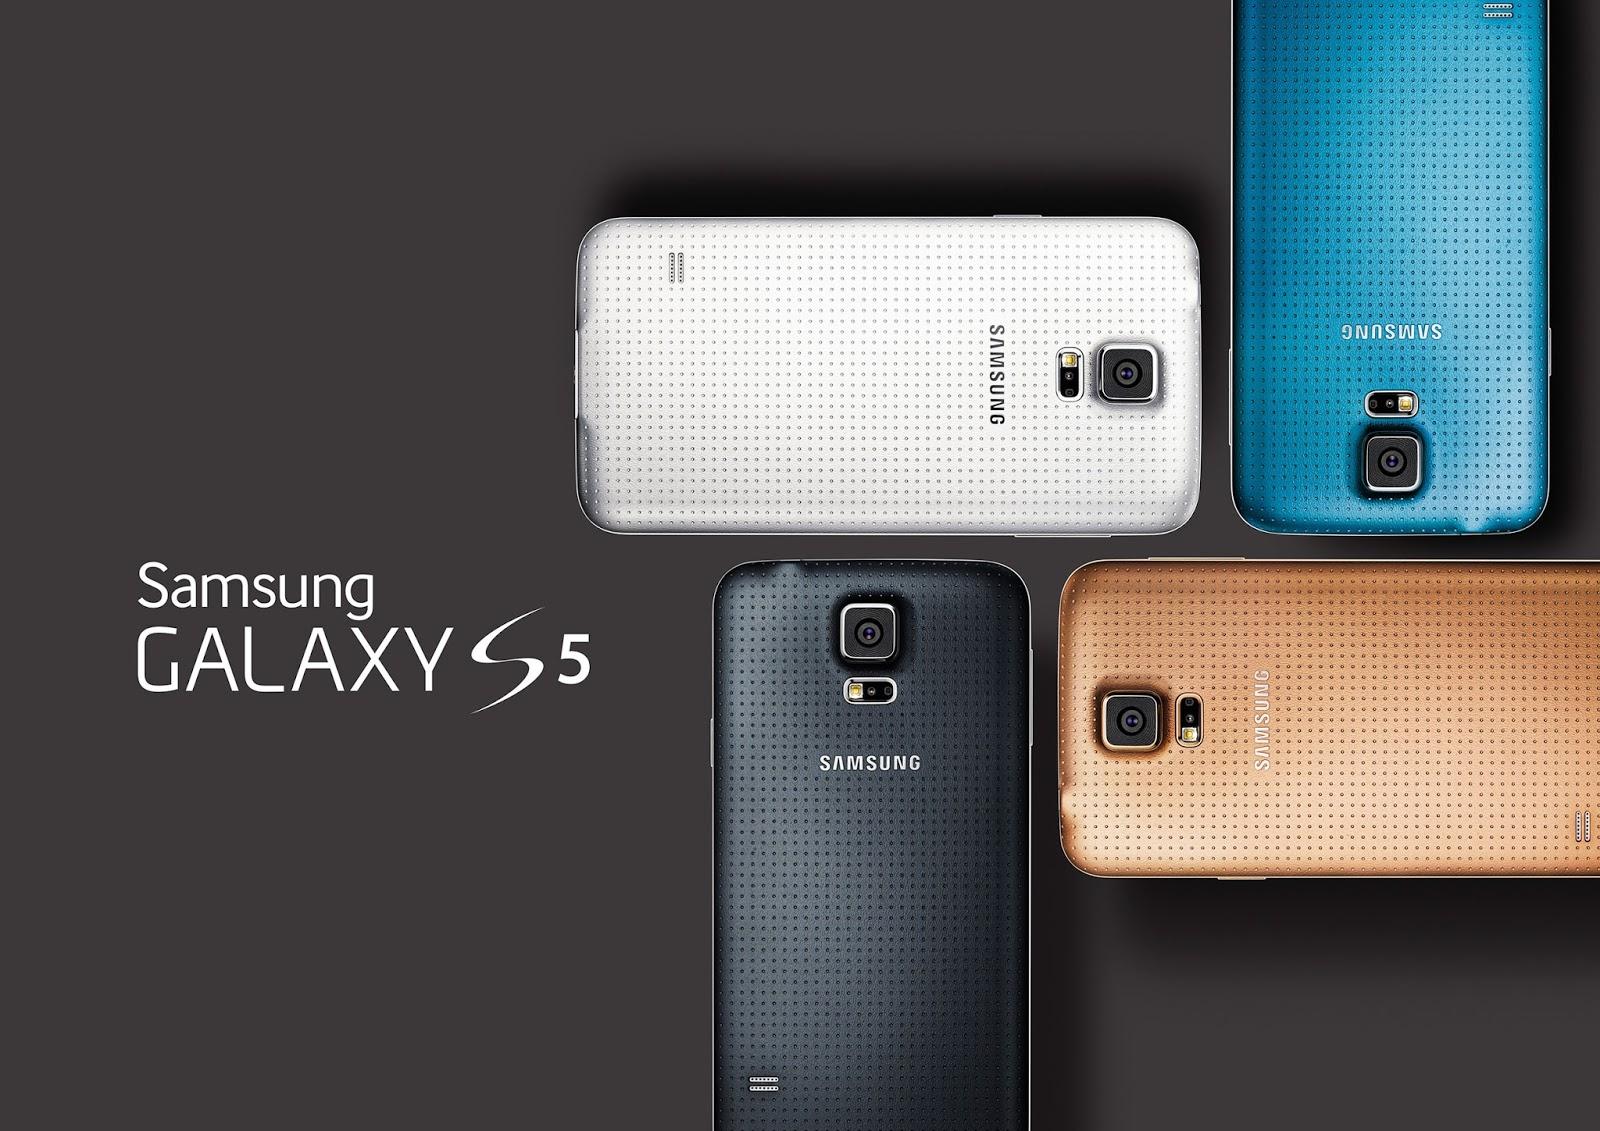 Pernyataan Resmi Tentang Samsung Galaxy S5